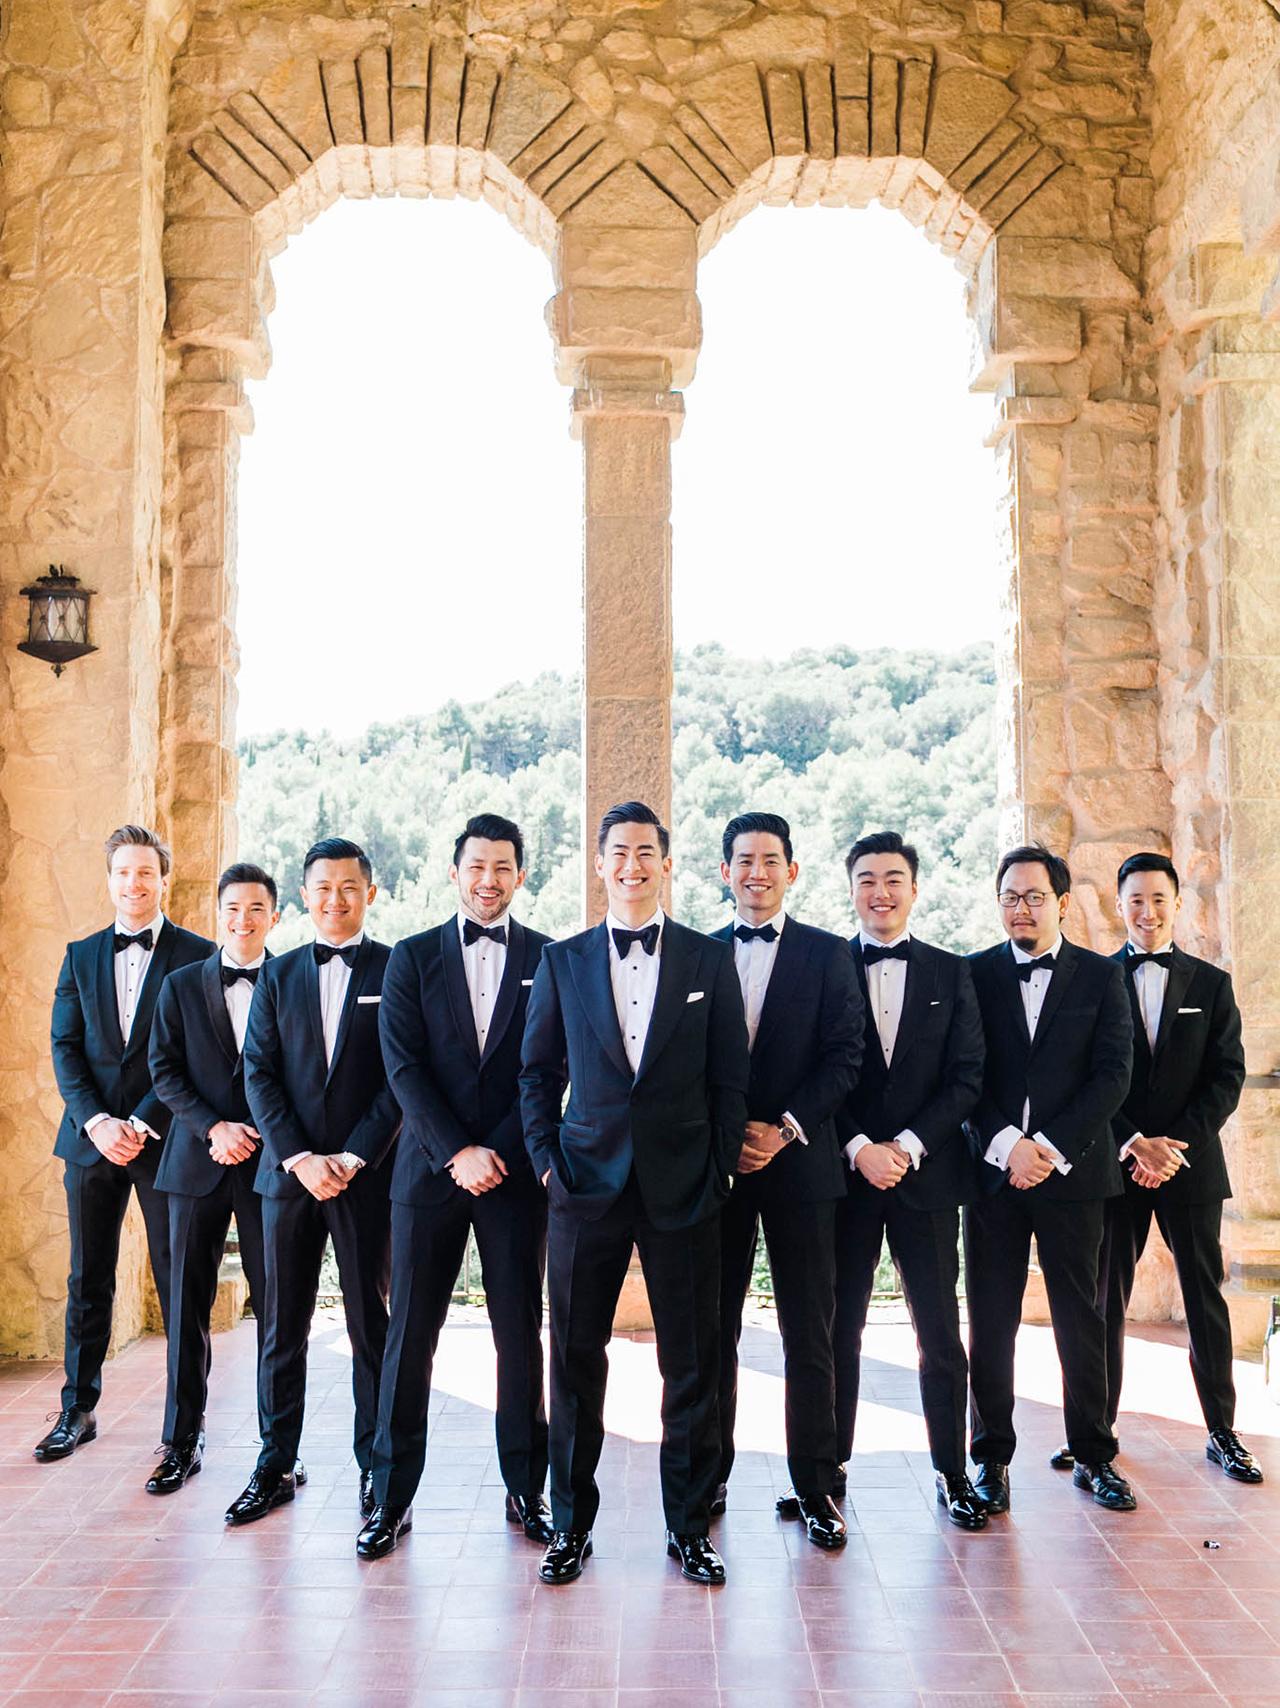 groom groomsmen pose in black tuxedo line up